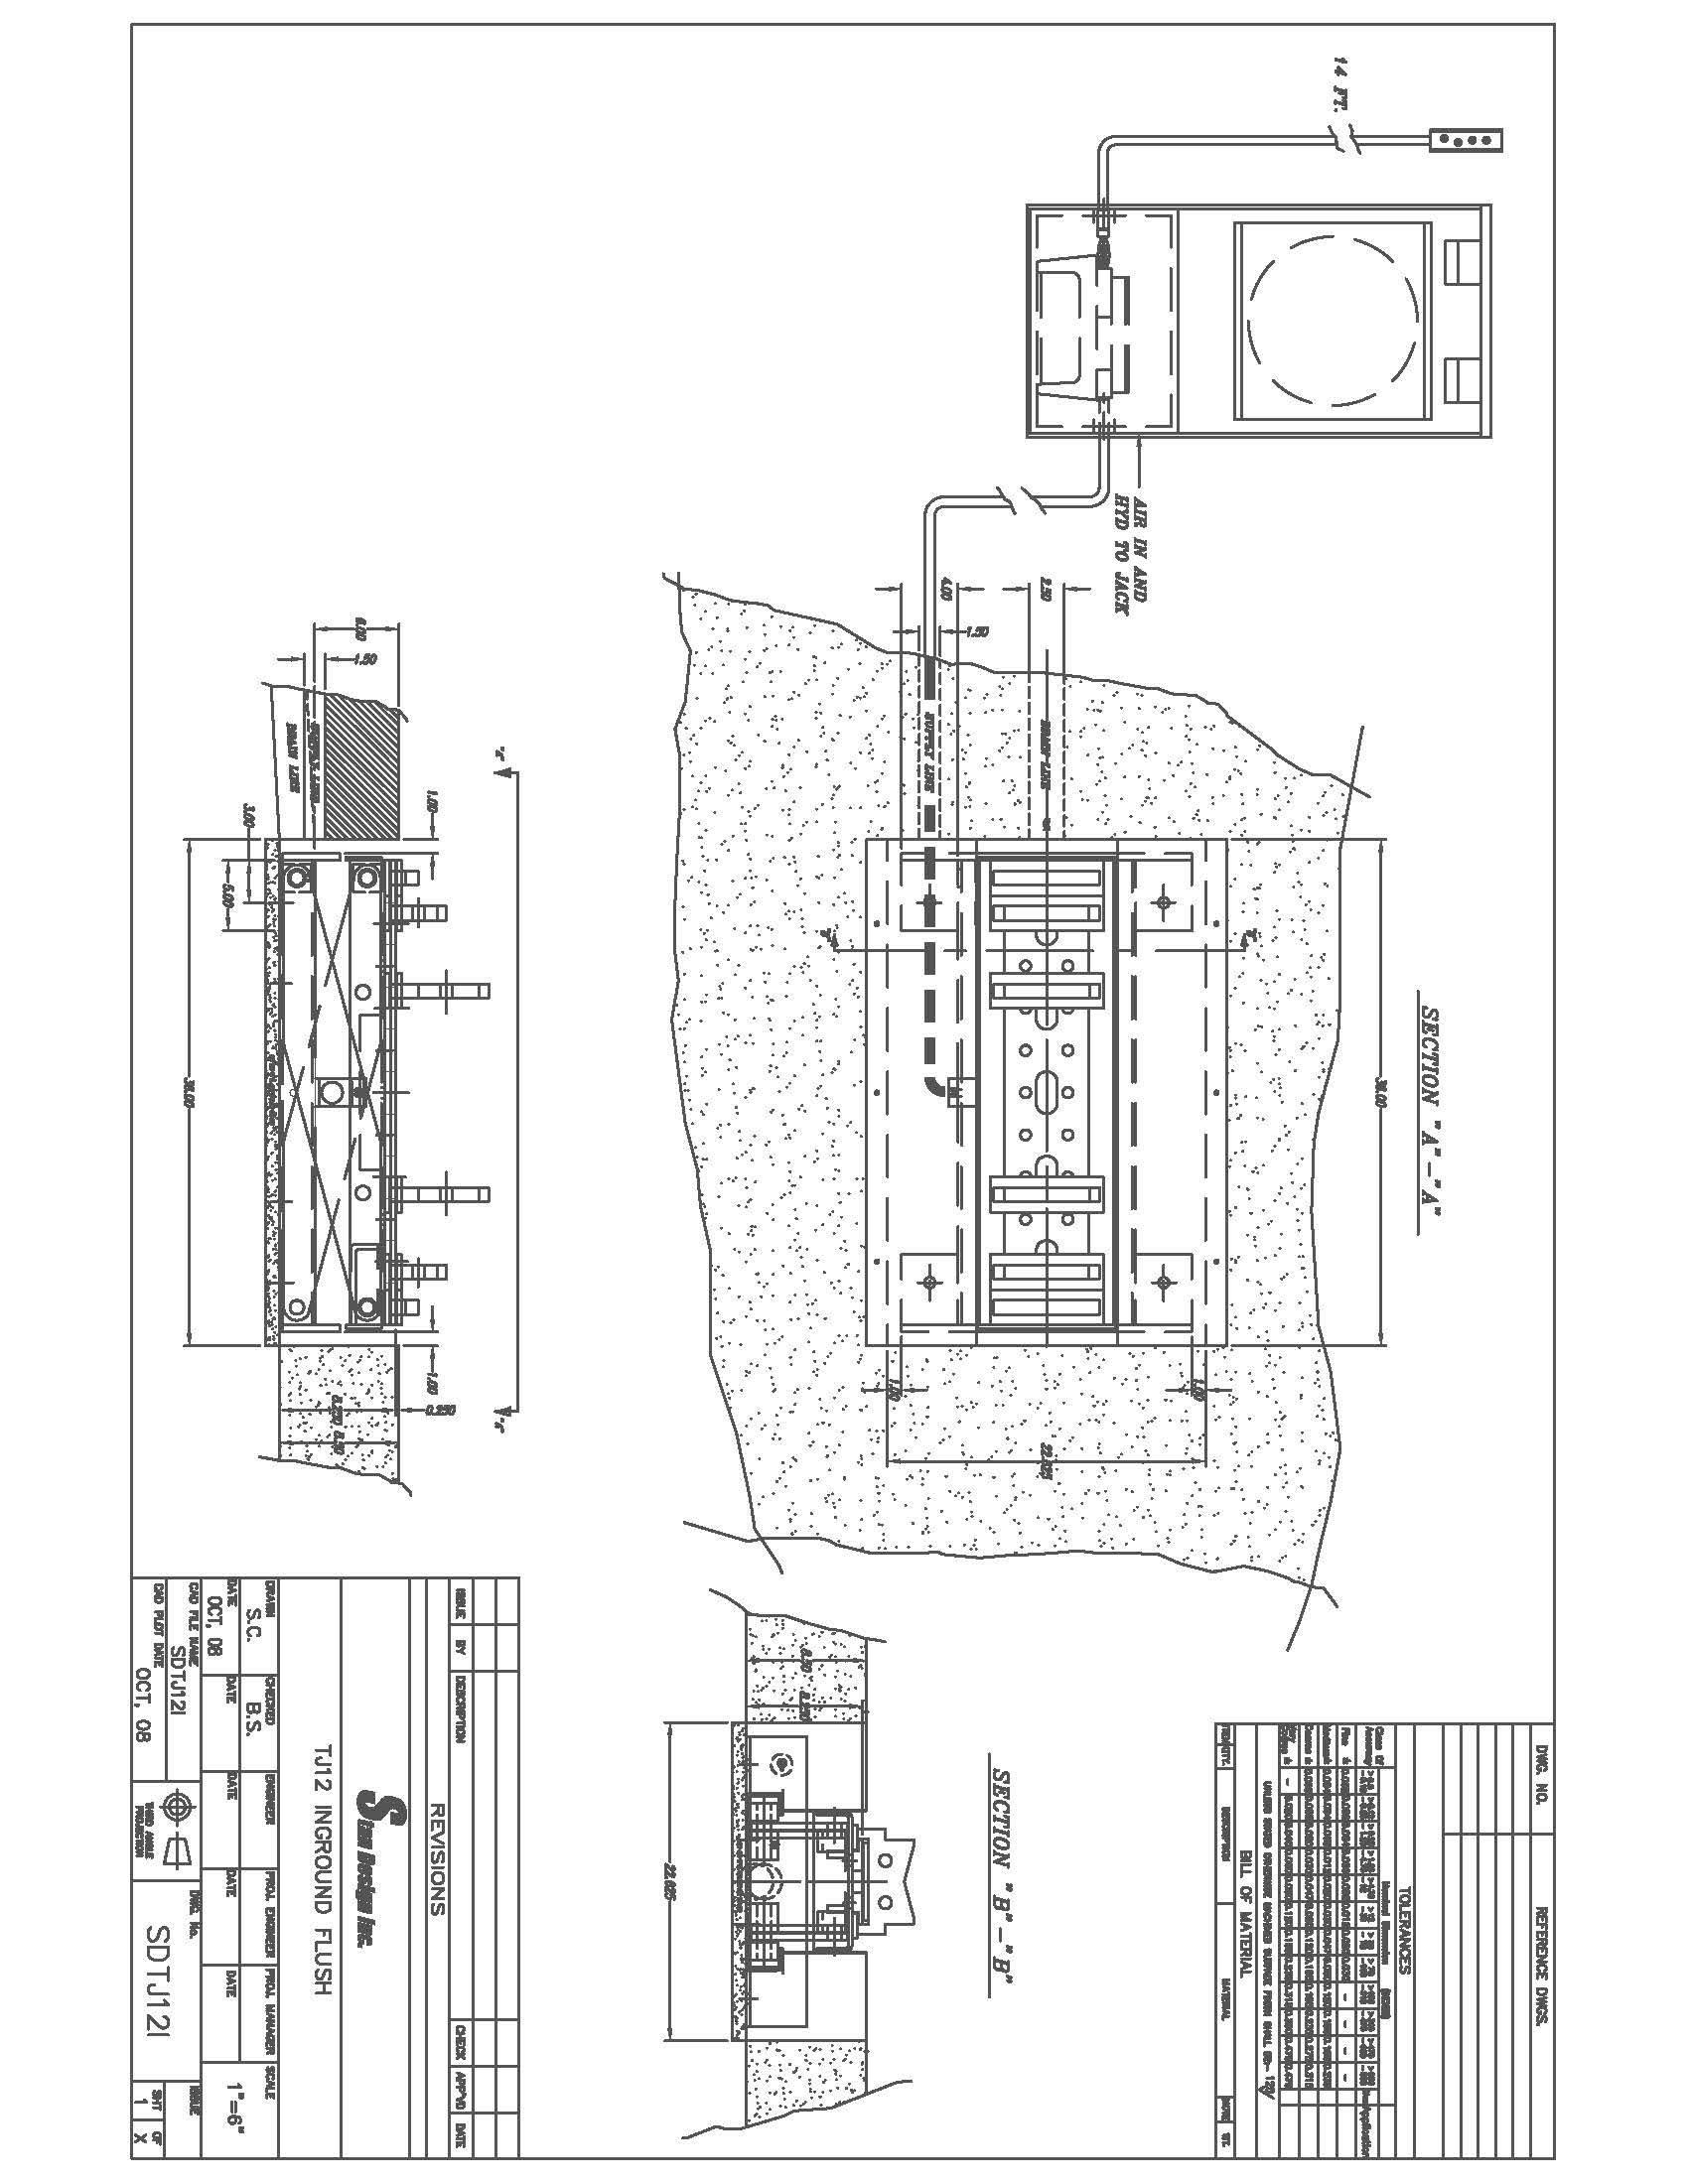 TJ121G image 1